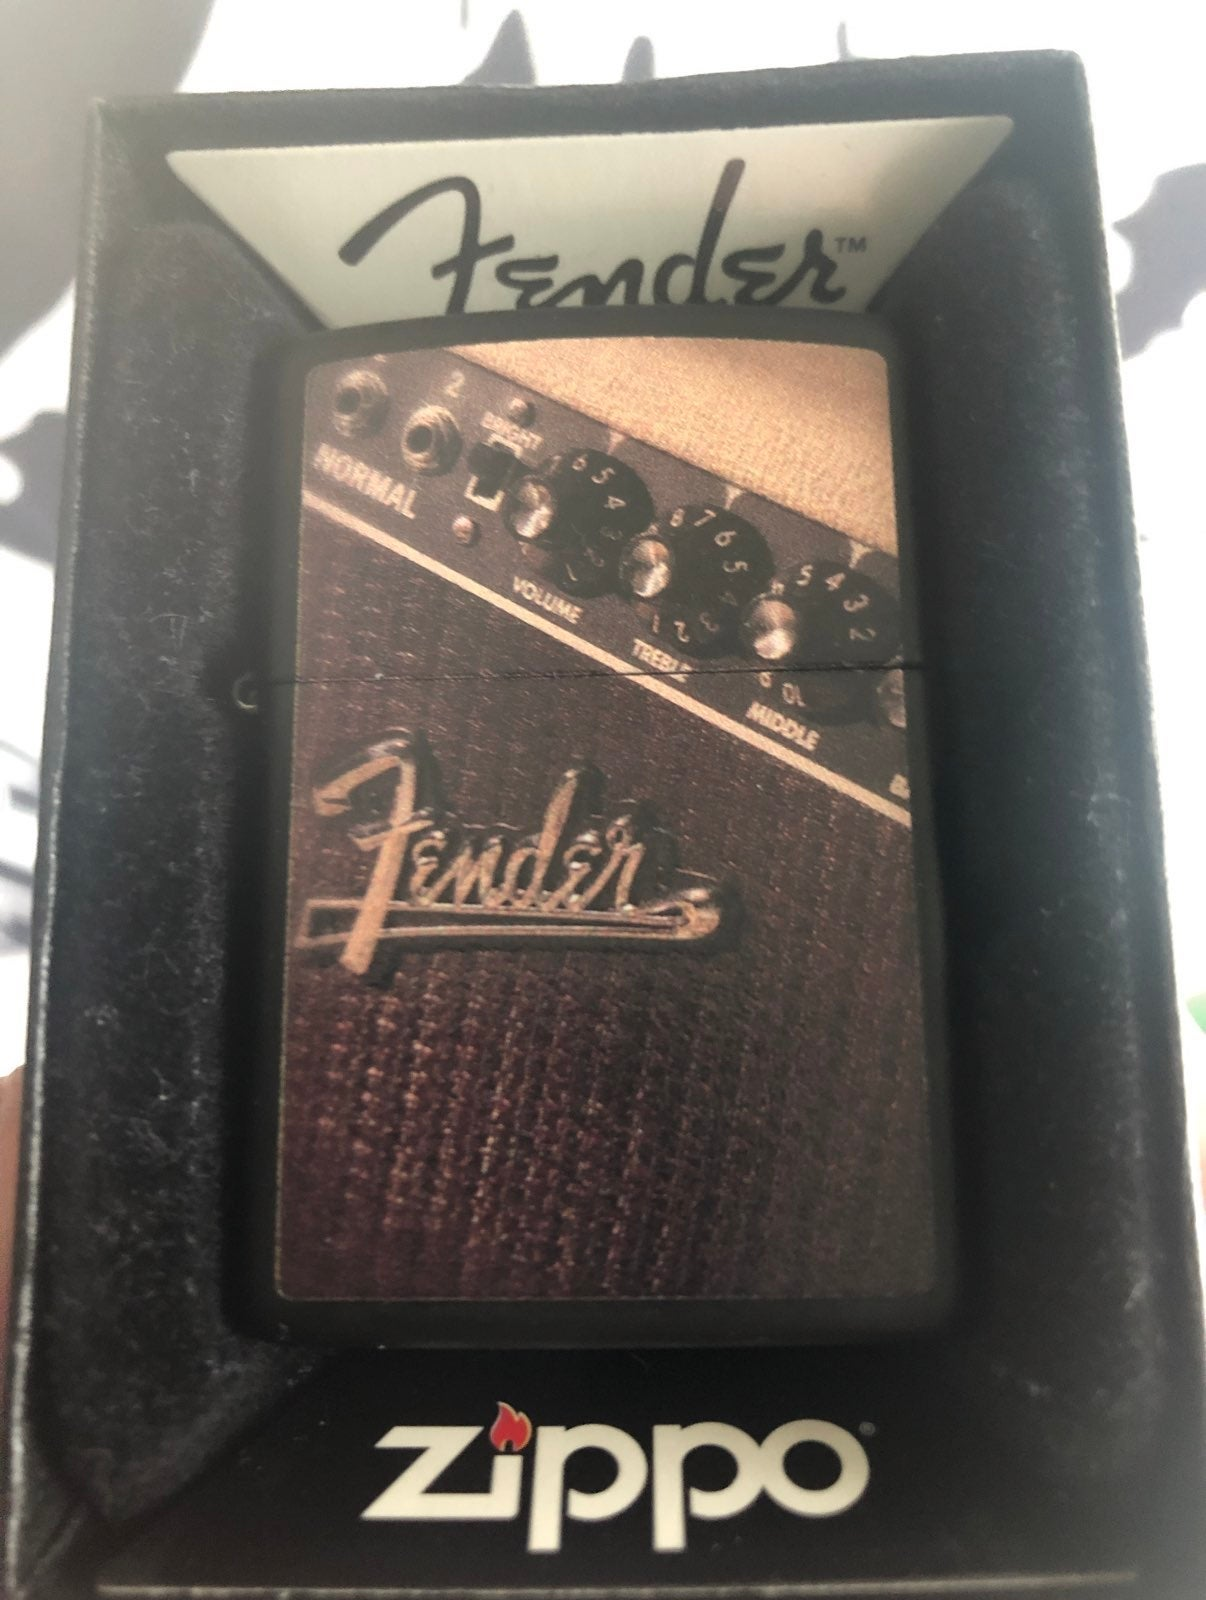 Fender Zippo